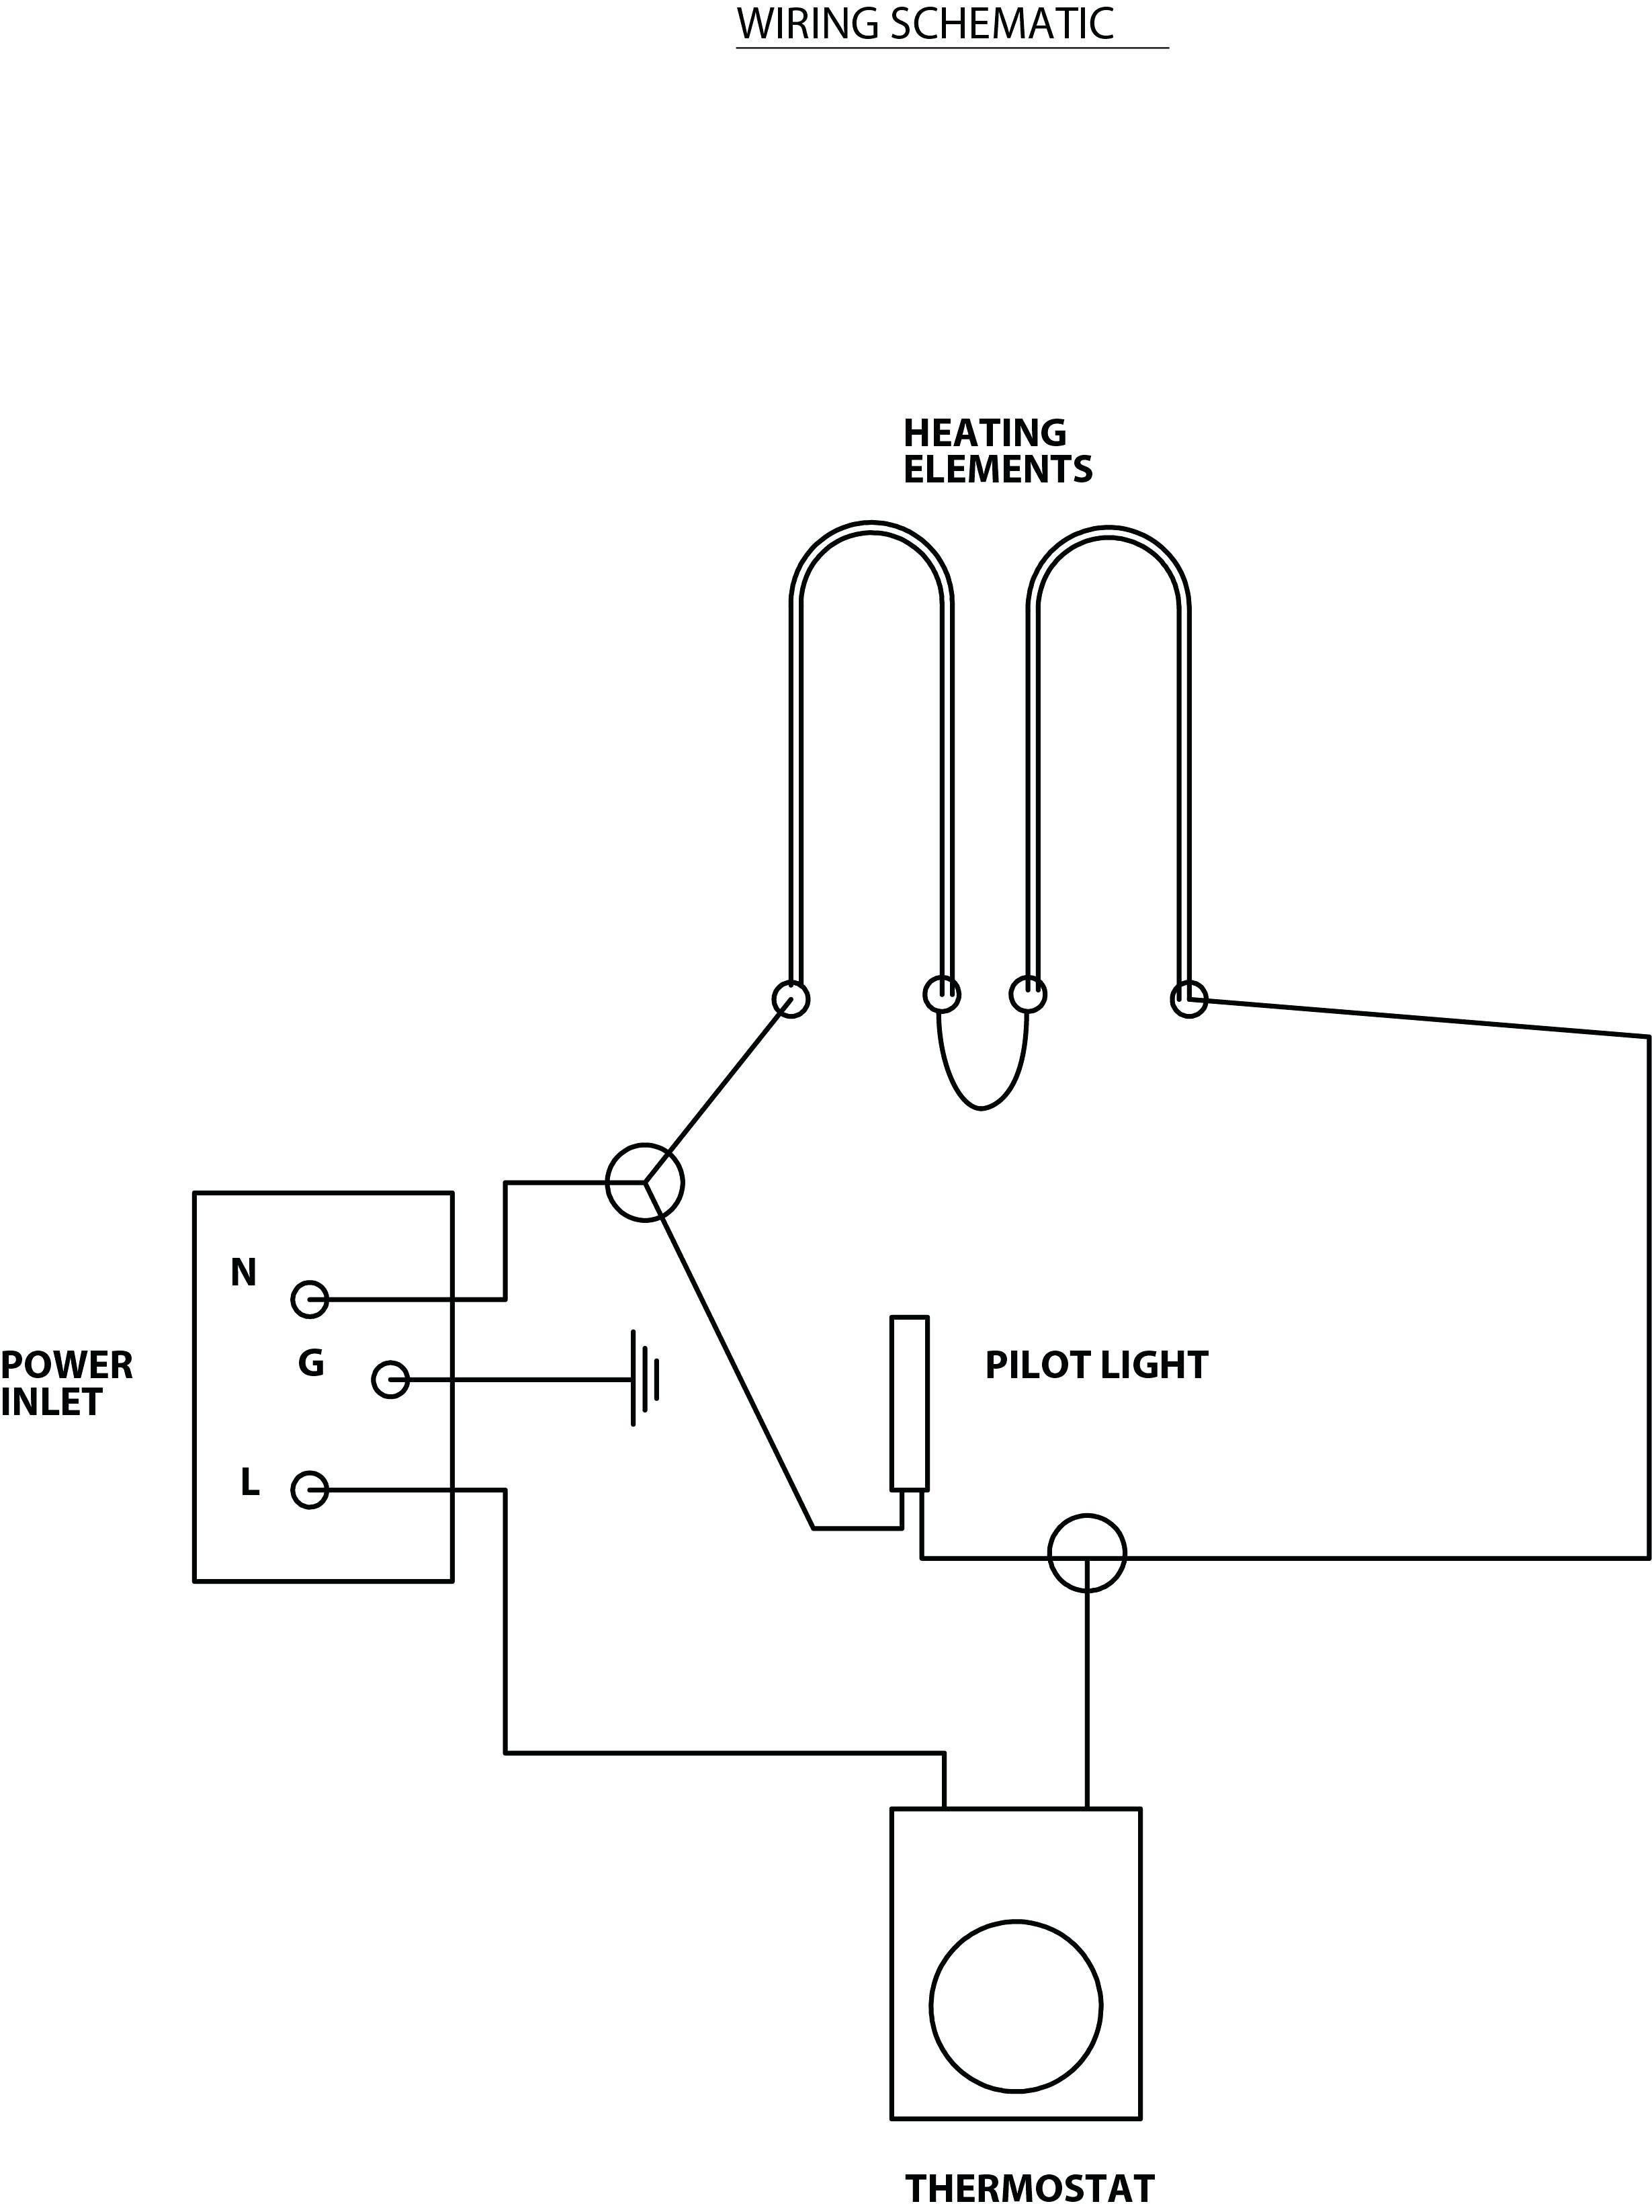 Marley Electric Baseboard Heater Wiring Diagram Sample